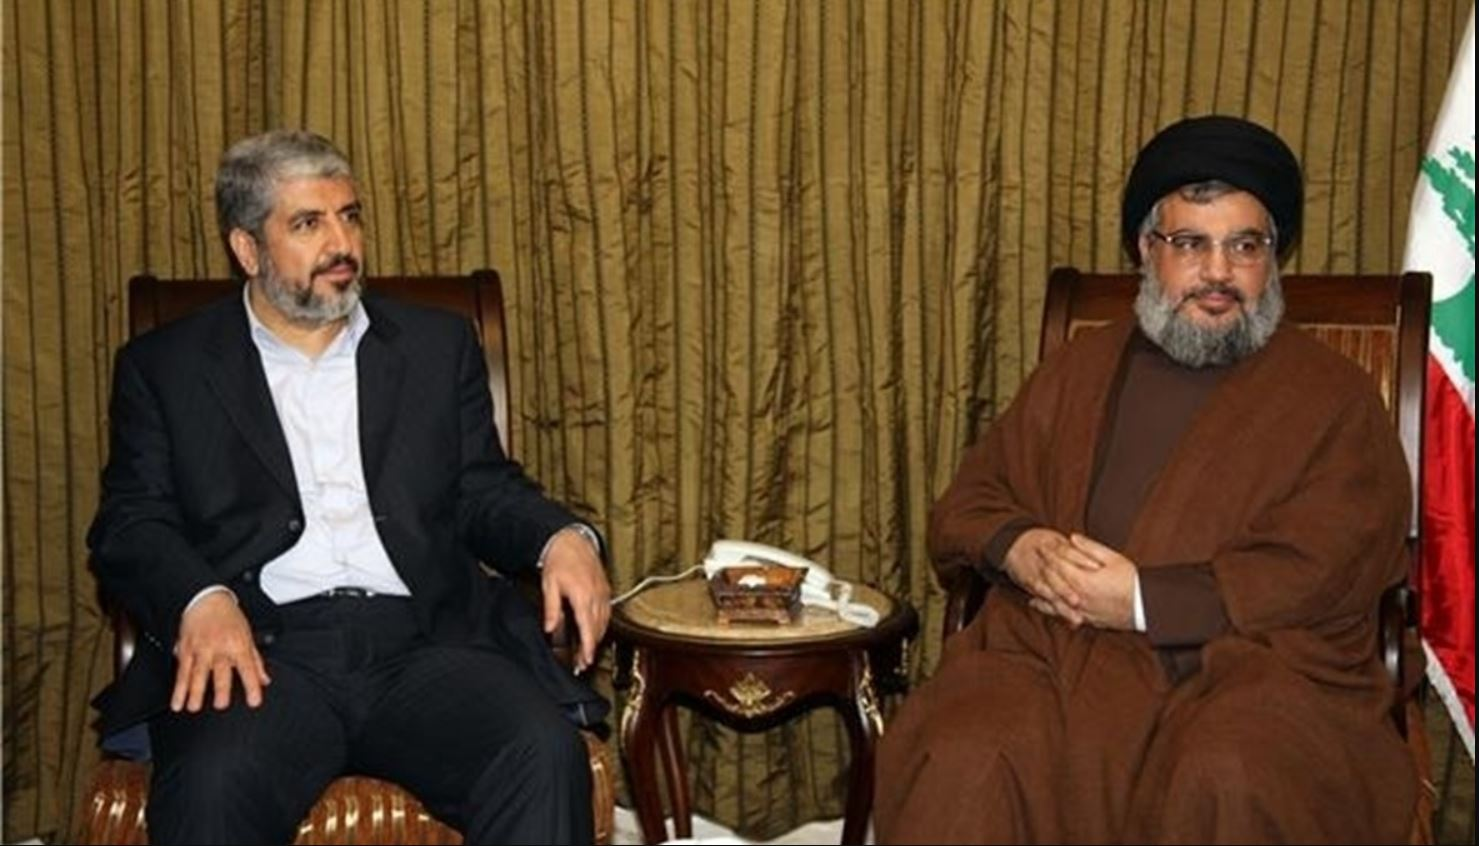 The Secretary General of the Lebanese Hezbollah, Hassan Nasrallah and Khaled Mesha'l